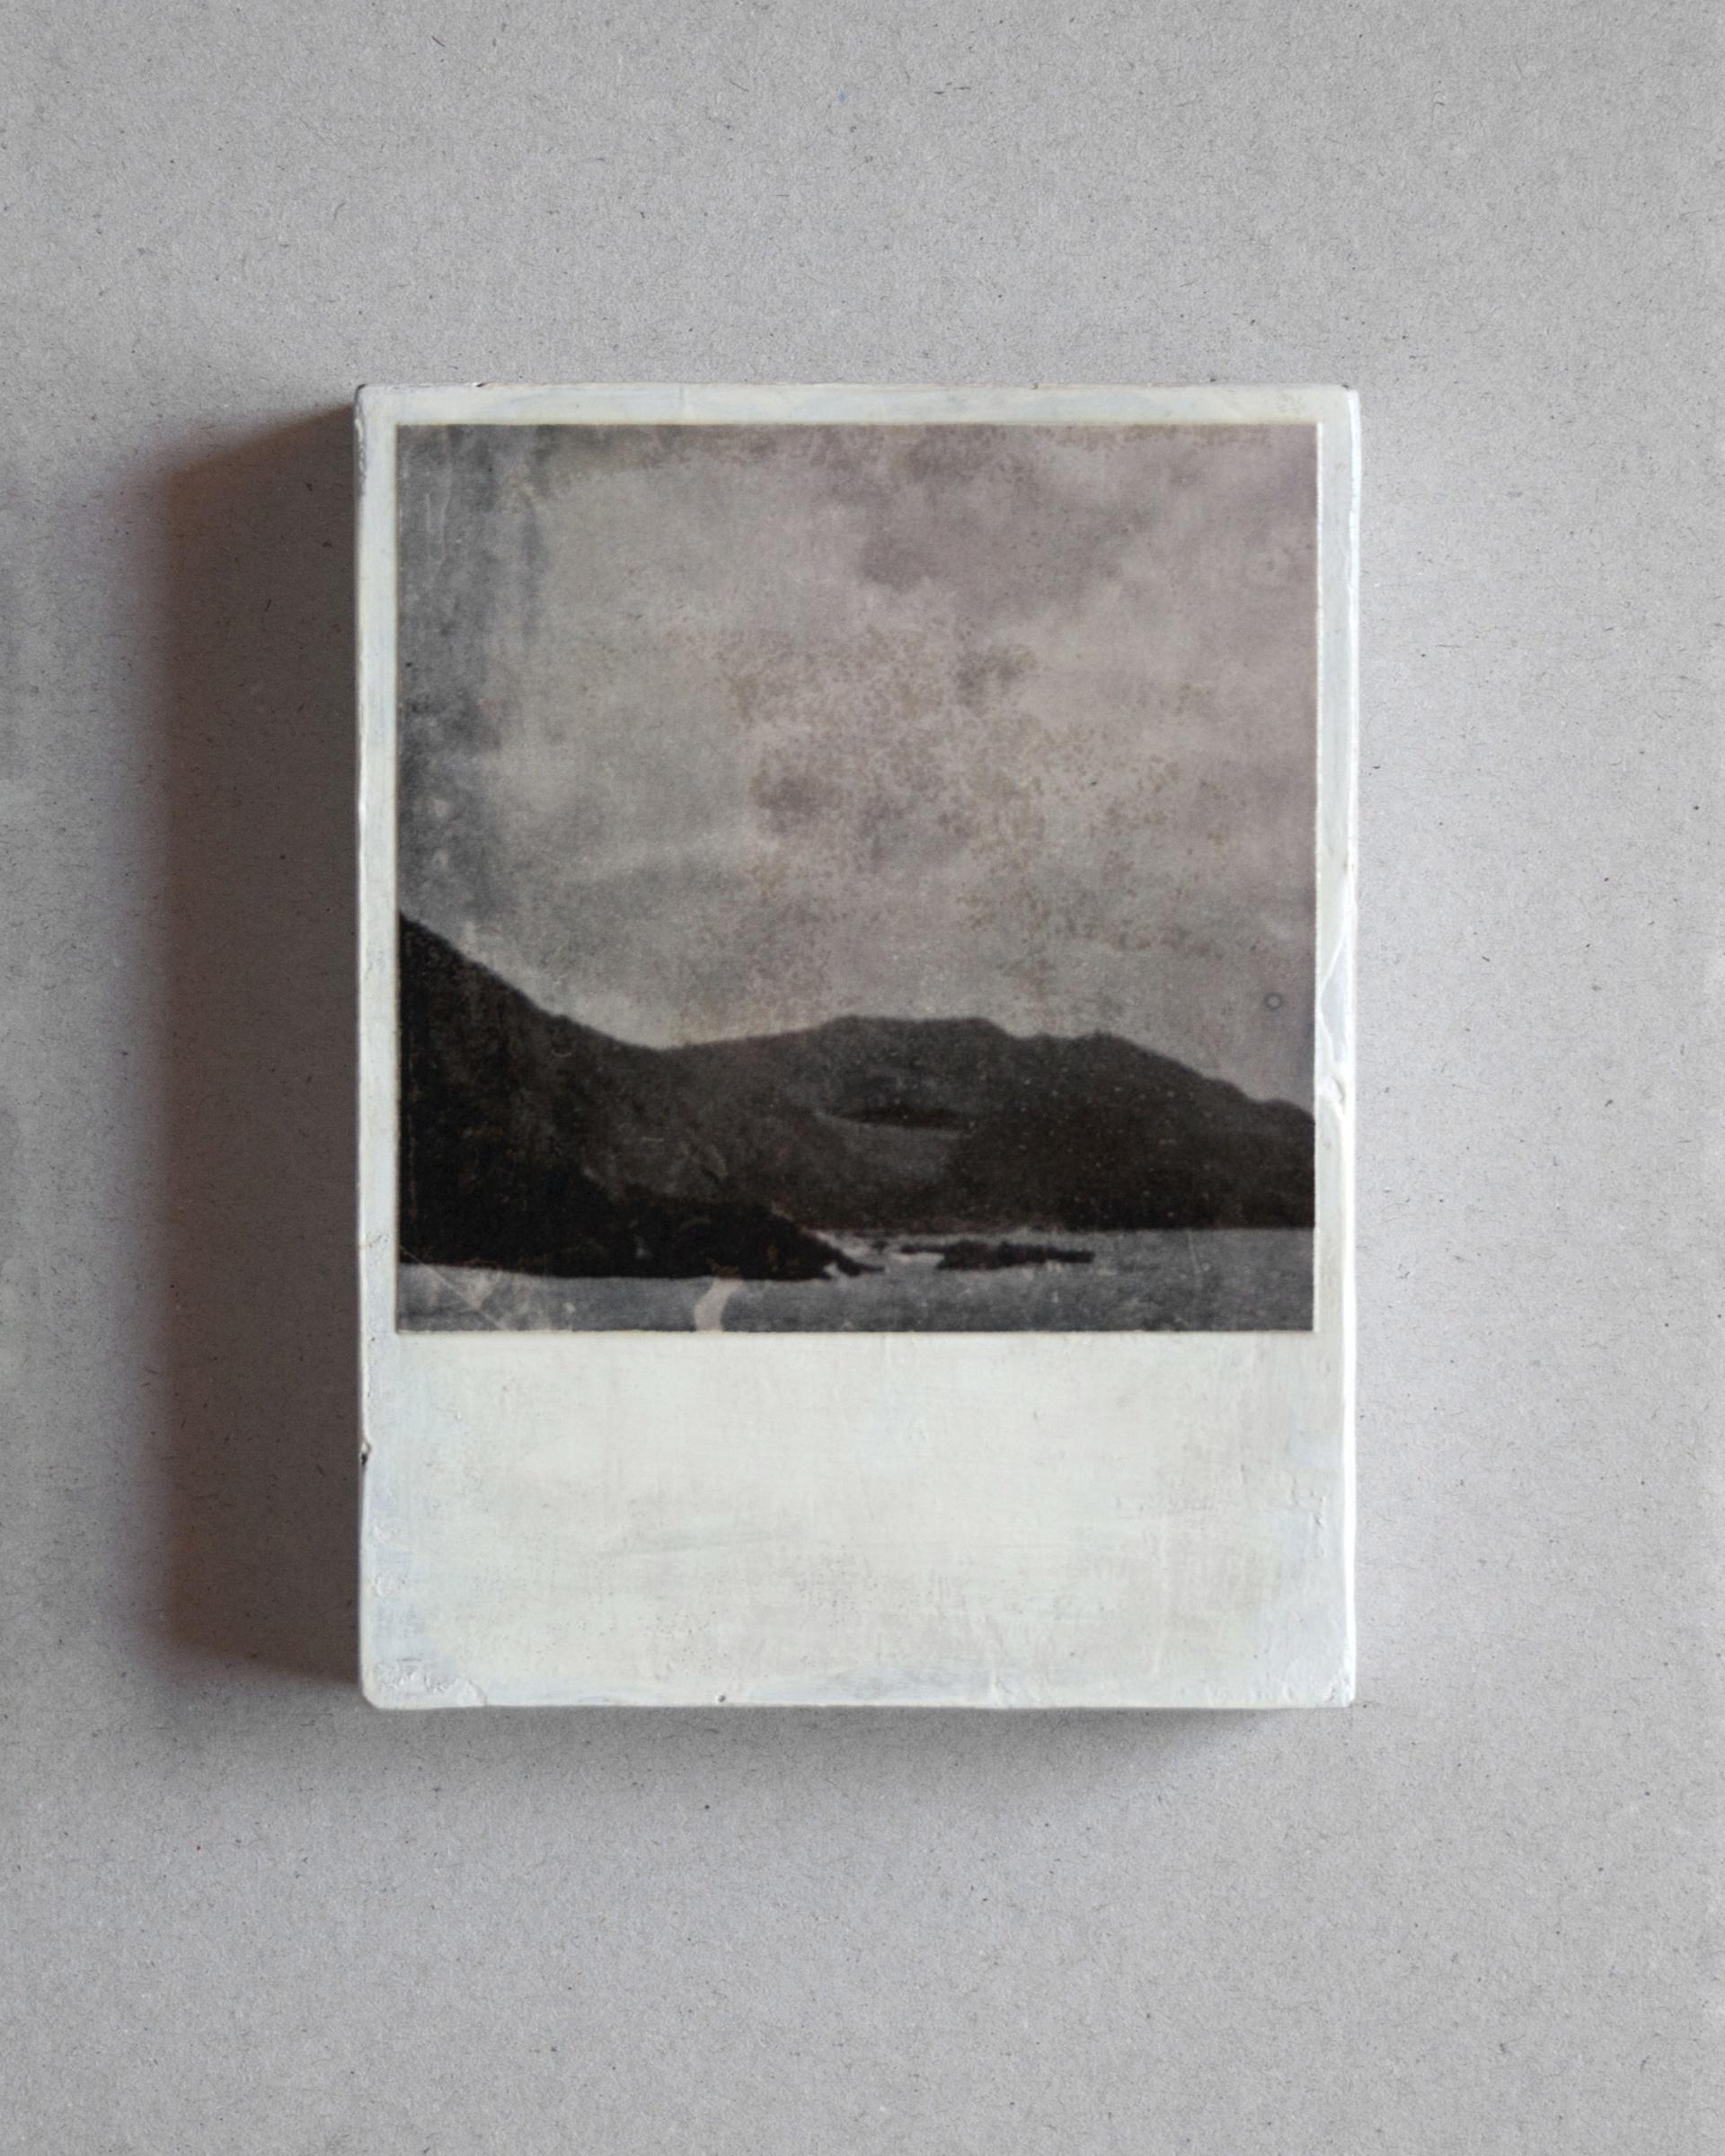 Rosendo Cid. Serie Paisajes. Madera, fotografía y barniz. 13x10x2 cm. 2020